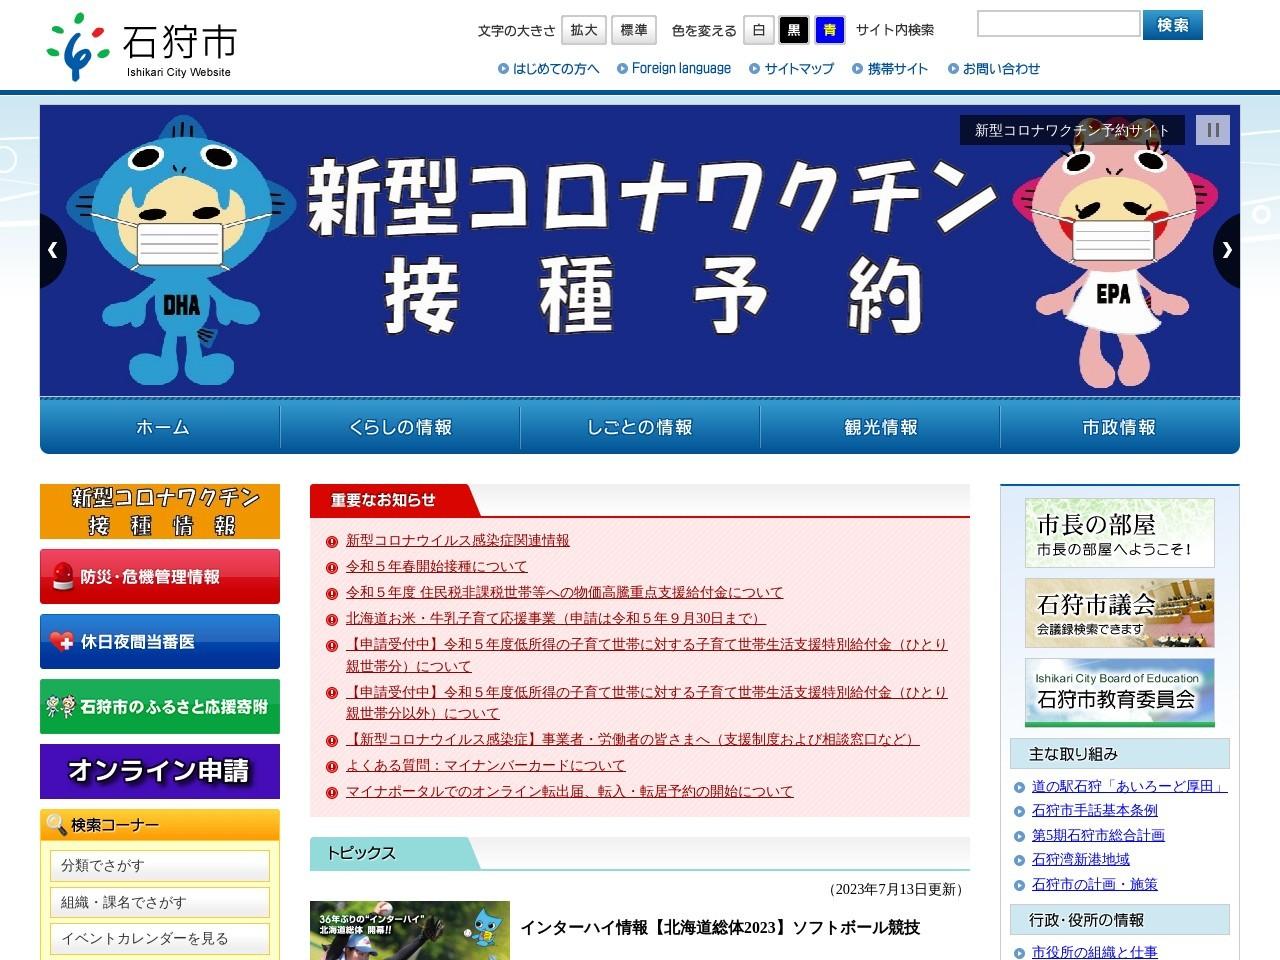 http://www.city.ishikari.hokkaido.jp/site/kyouiku/14794.html